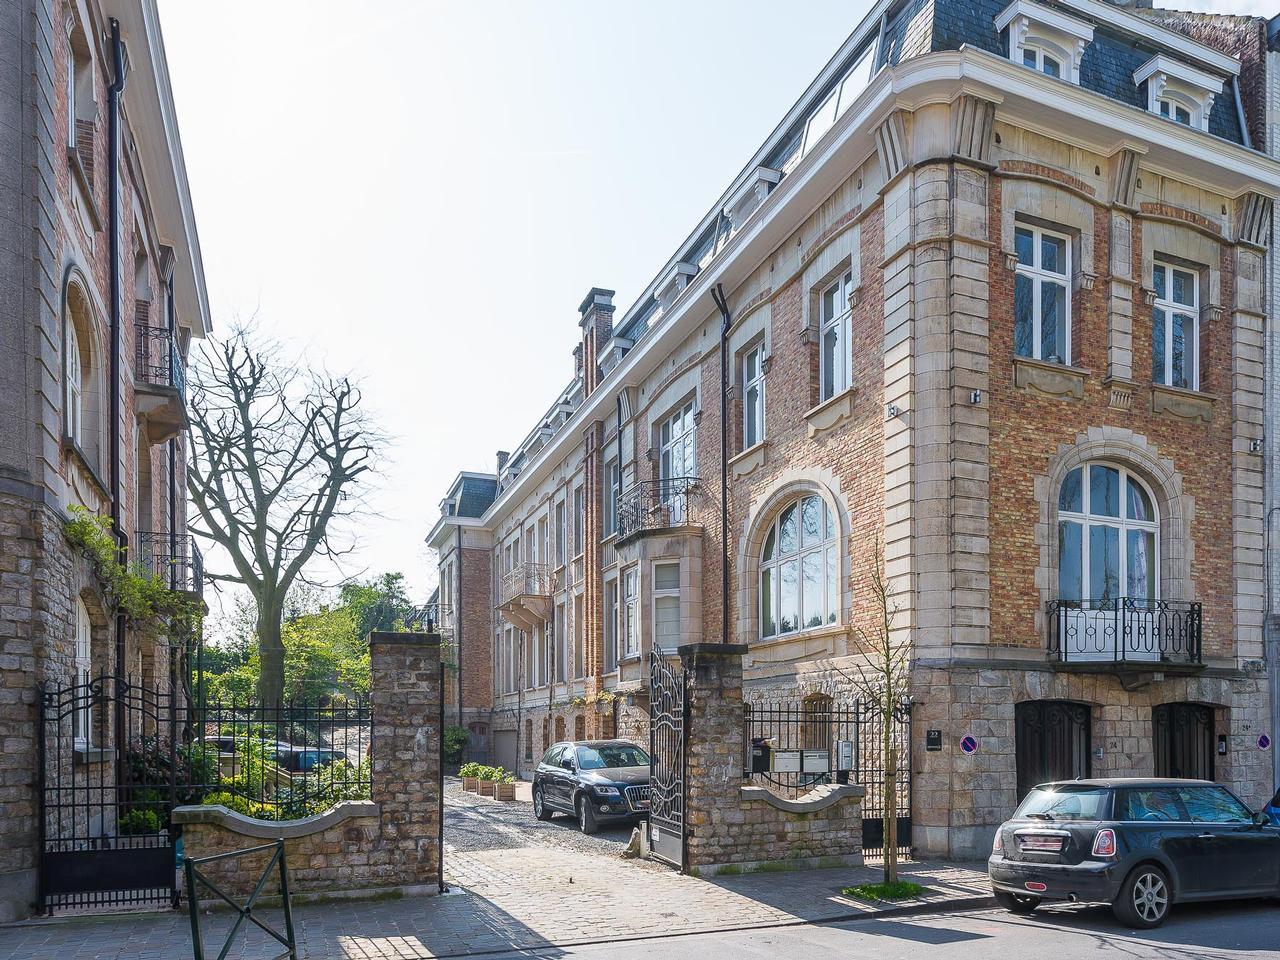 Wohnung für Verkauf beim Ixelles I Les Etangs Ixelles, Brussels, 1050 Belgien